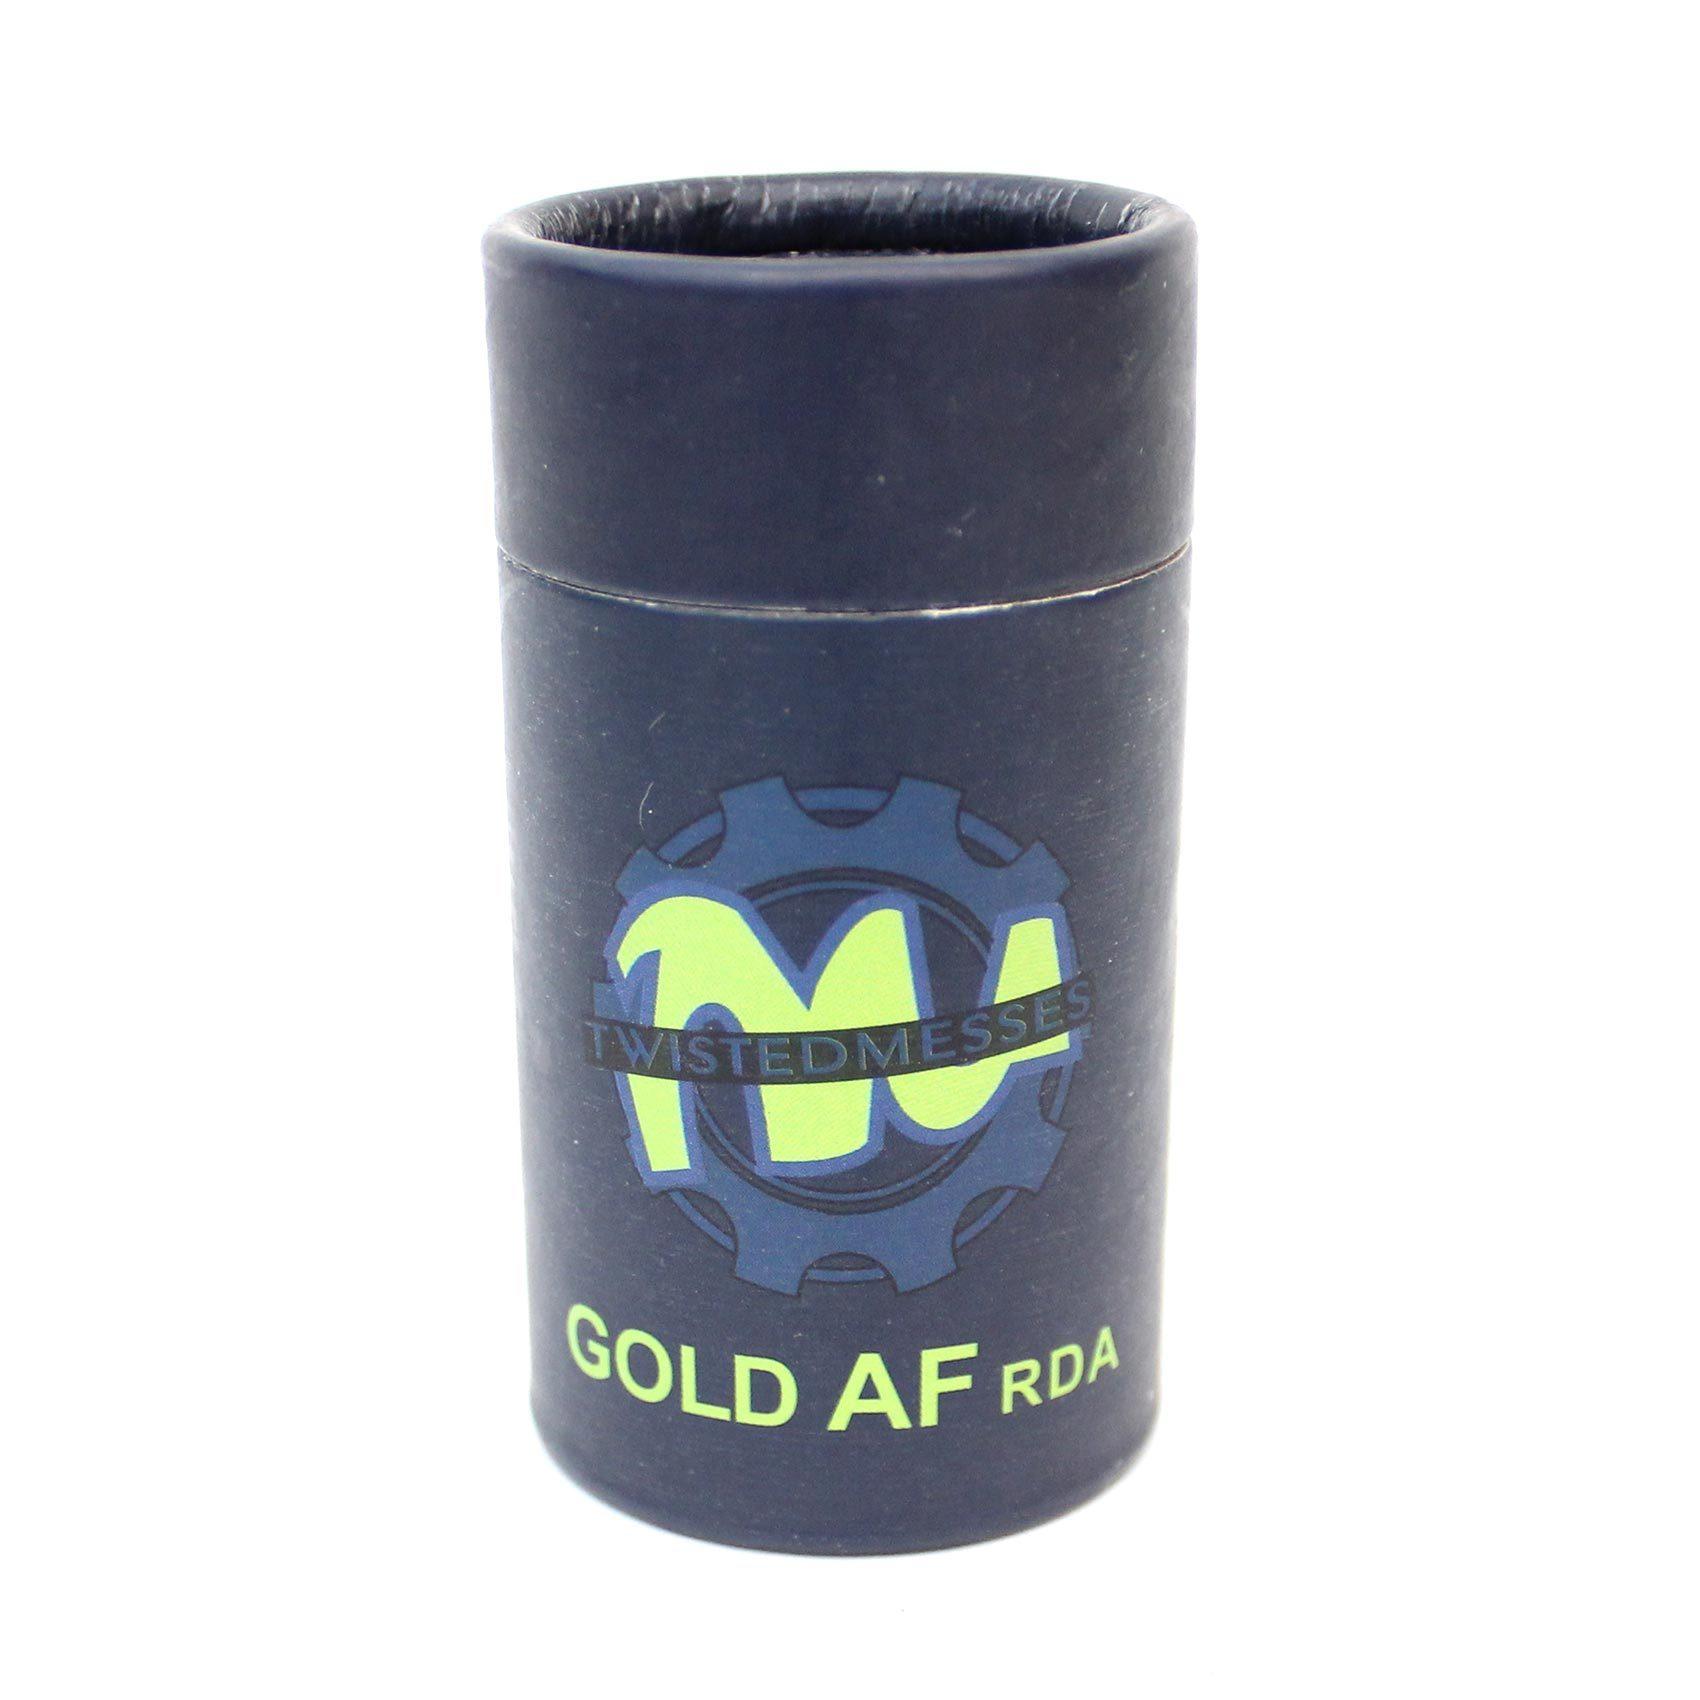 Дрипка Twisted Messes Gold AF (Clone) коробка